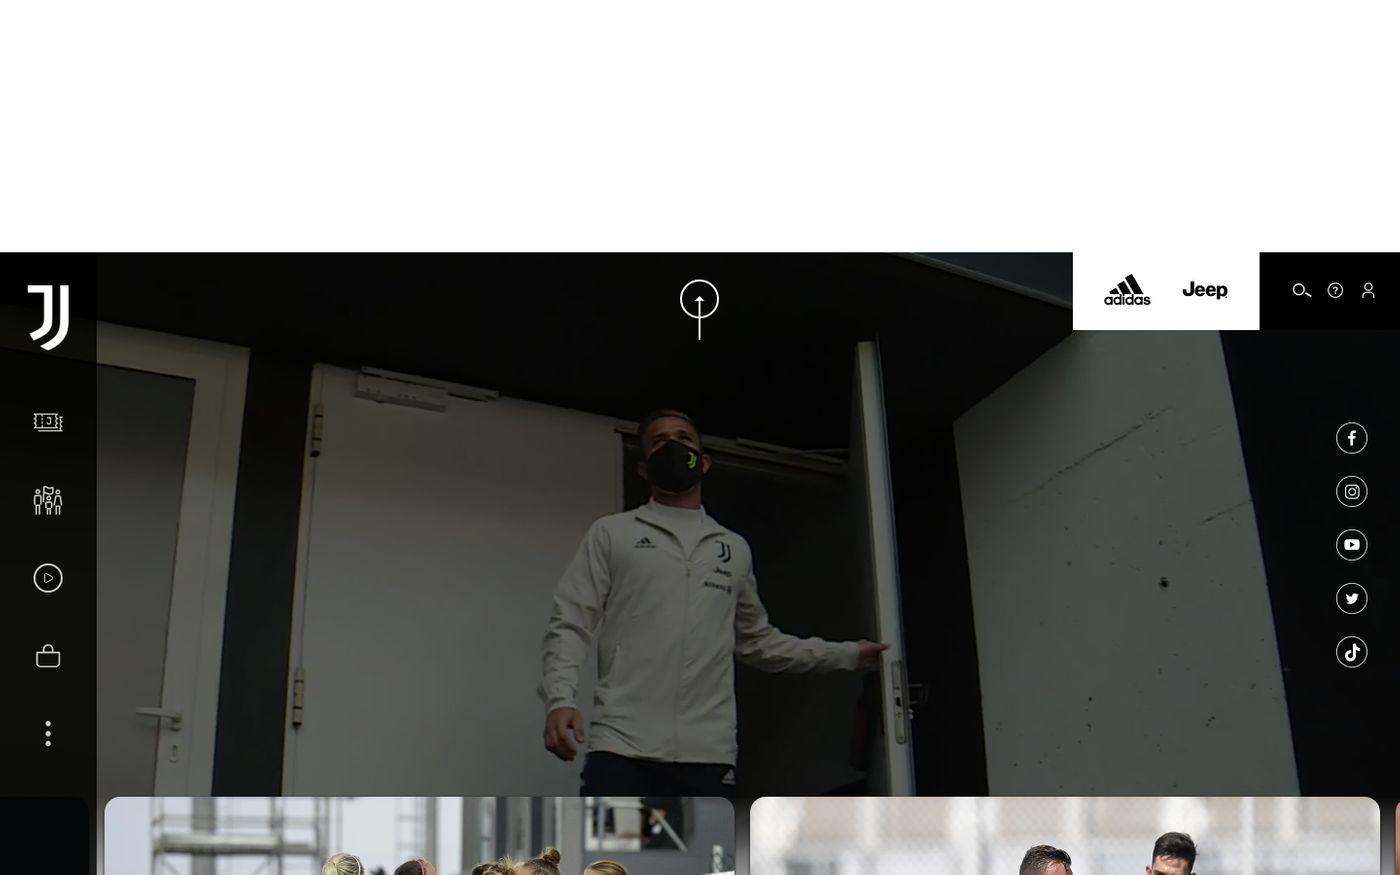 Screenshot of Juventus Football Club - Sito Ufficiale | Juventus.com website